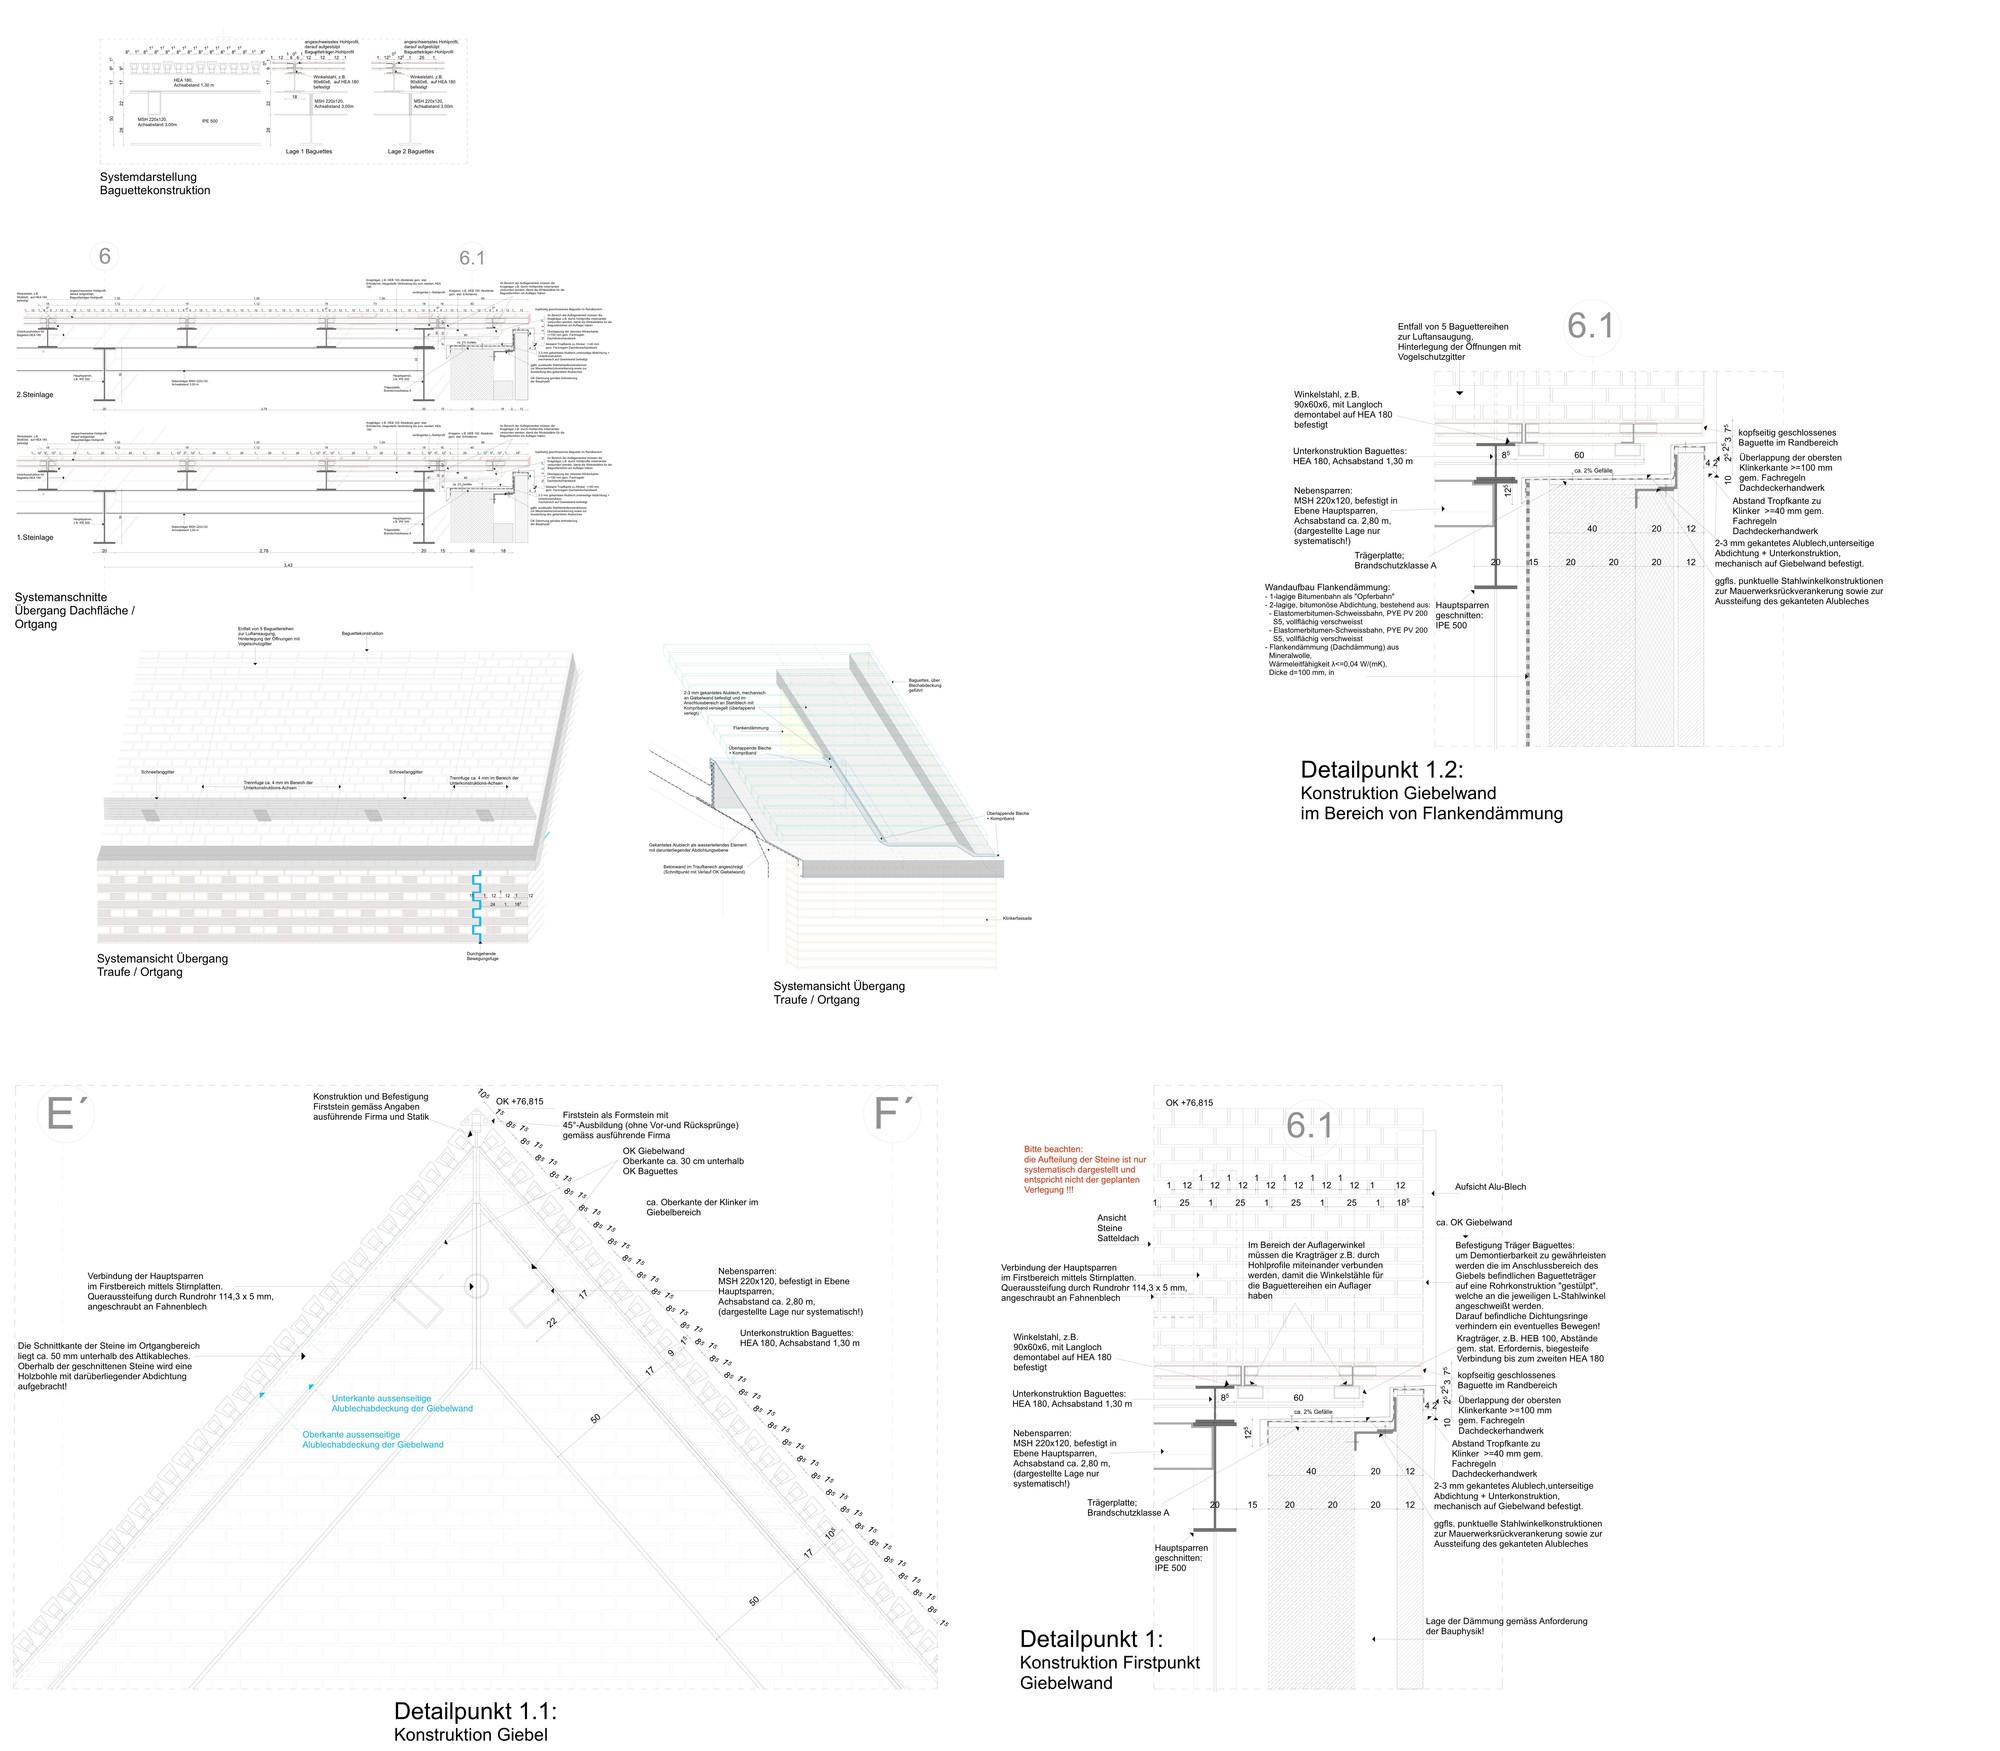 Guitar Wiring Diagram Visio Visio Building Diagram Wiring